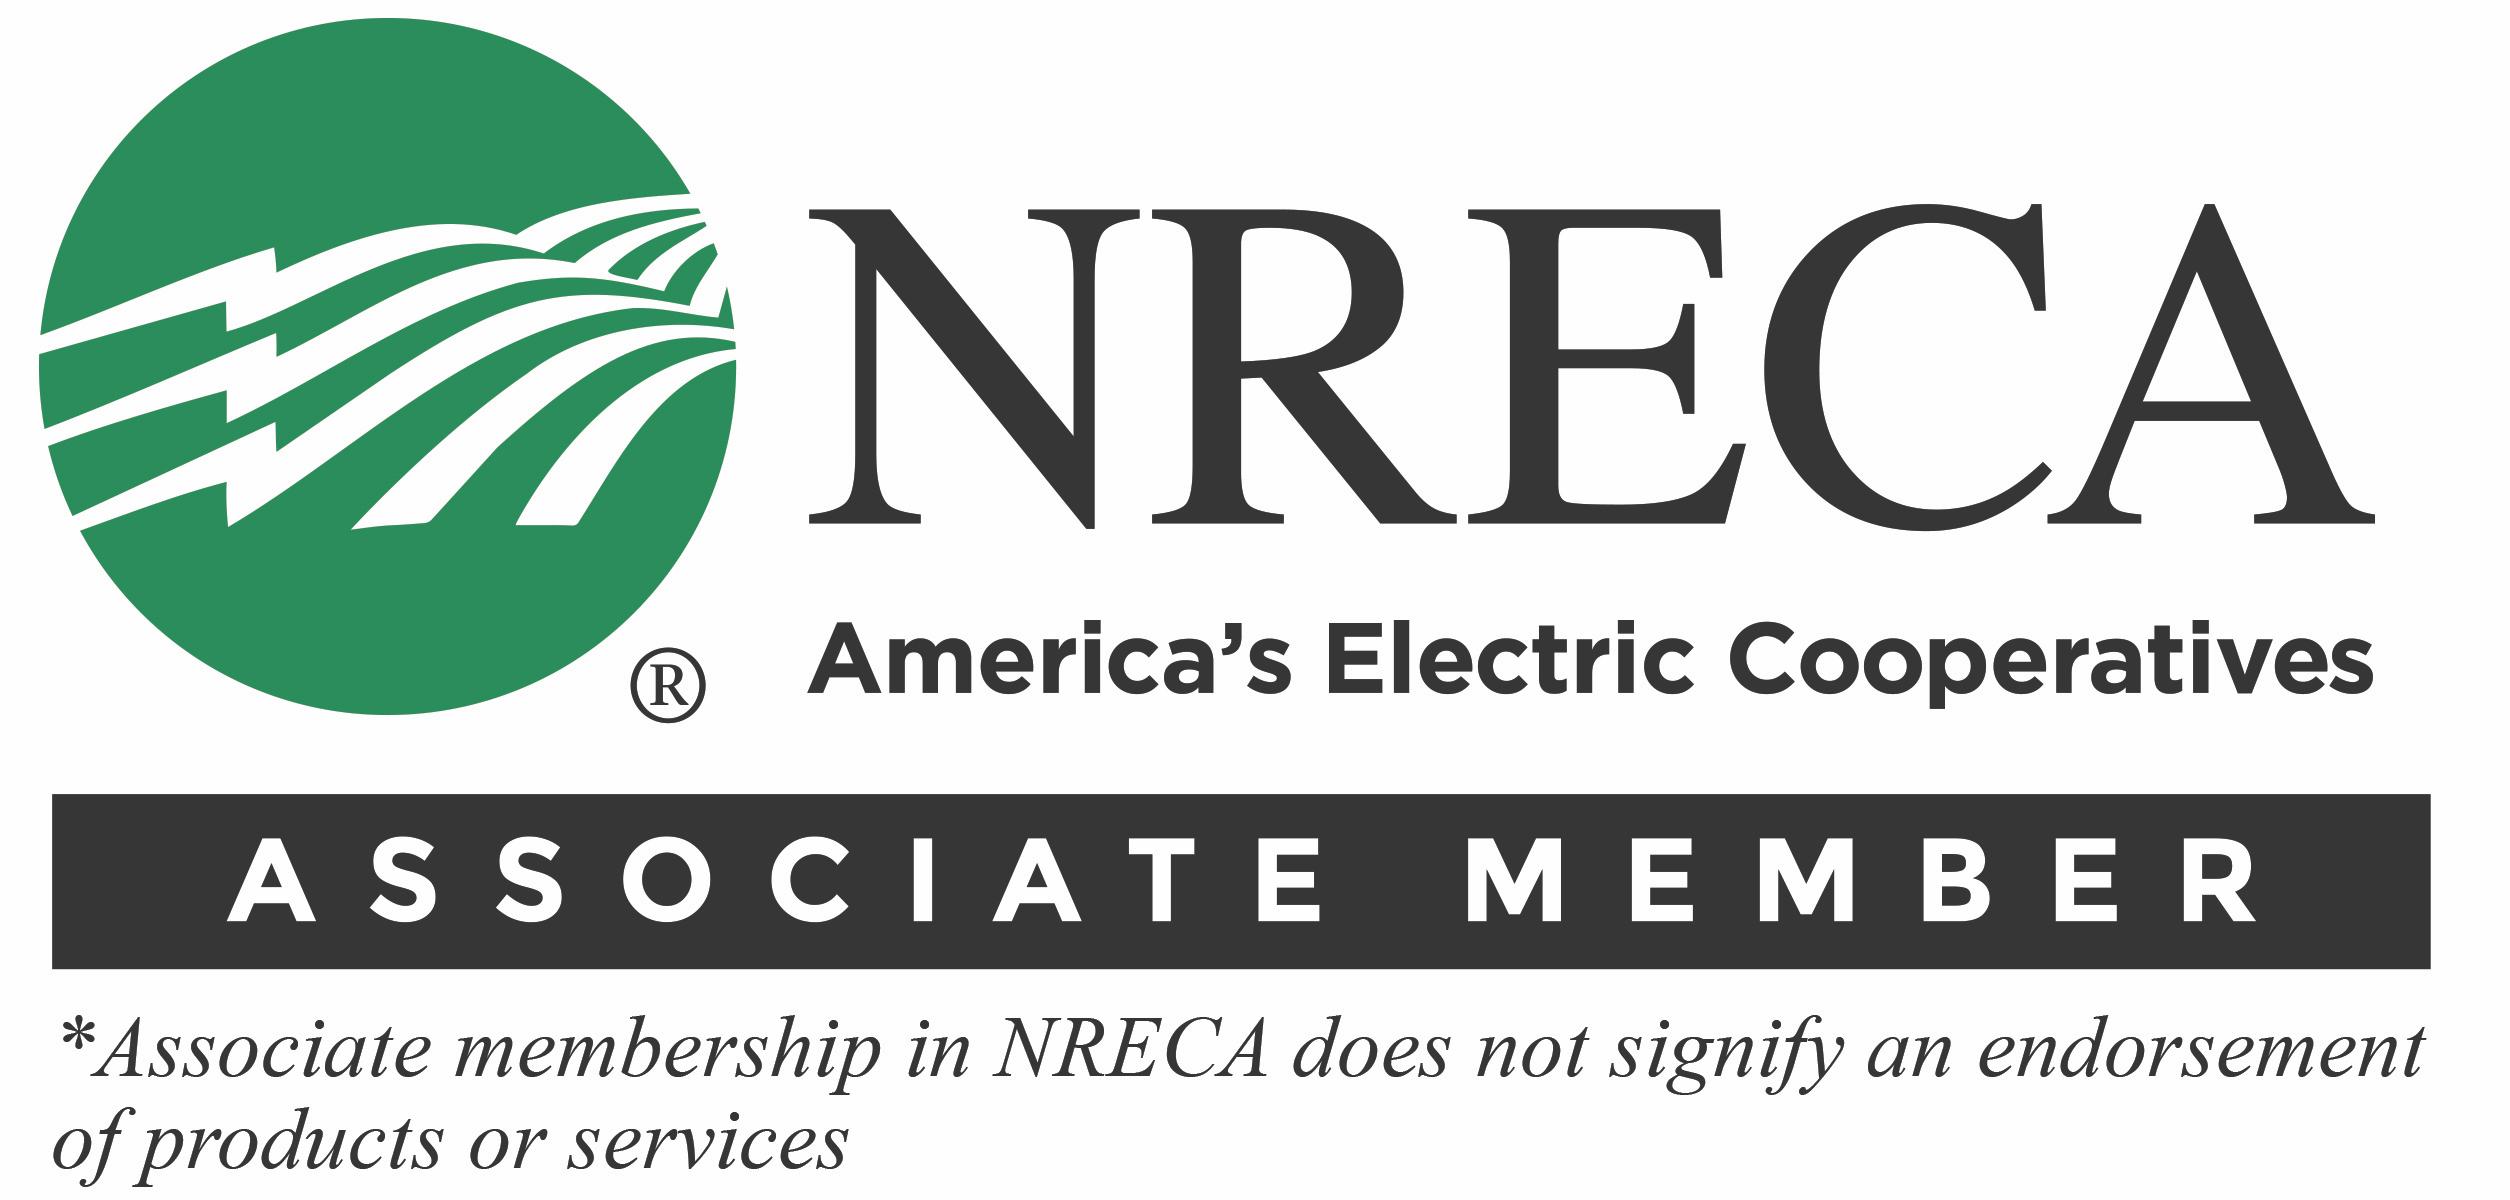 Eos is a proud associate member of the NRECA National Rural Electric Cooperative Association; NRECA logo shown here